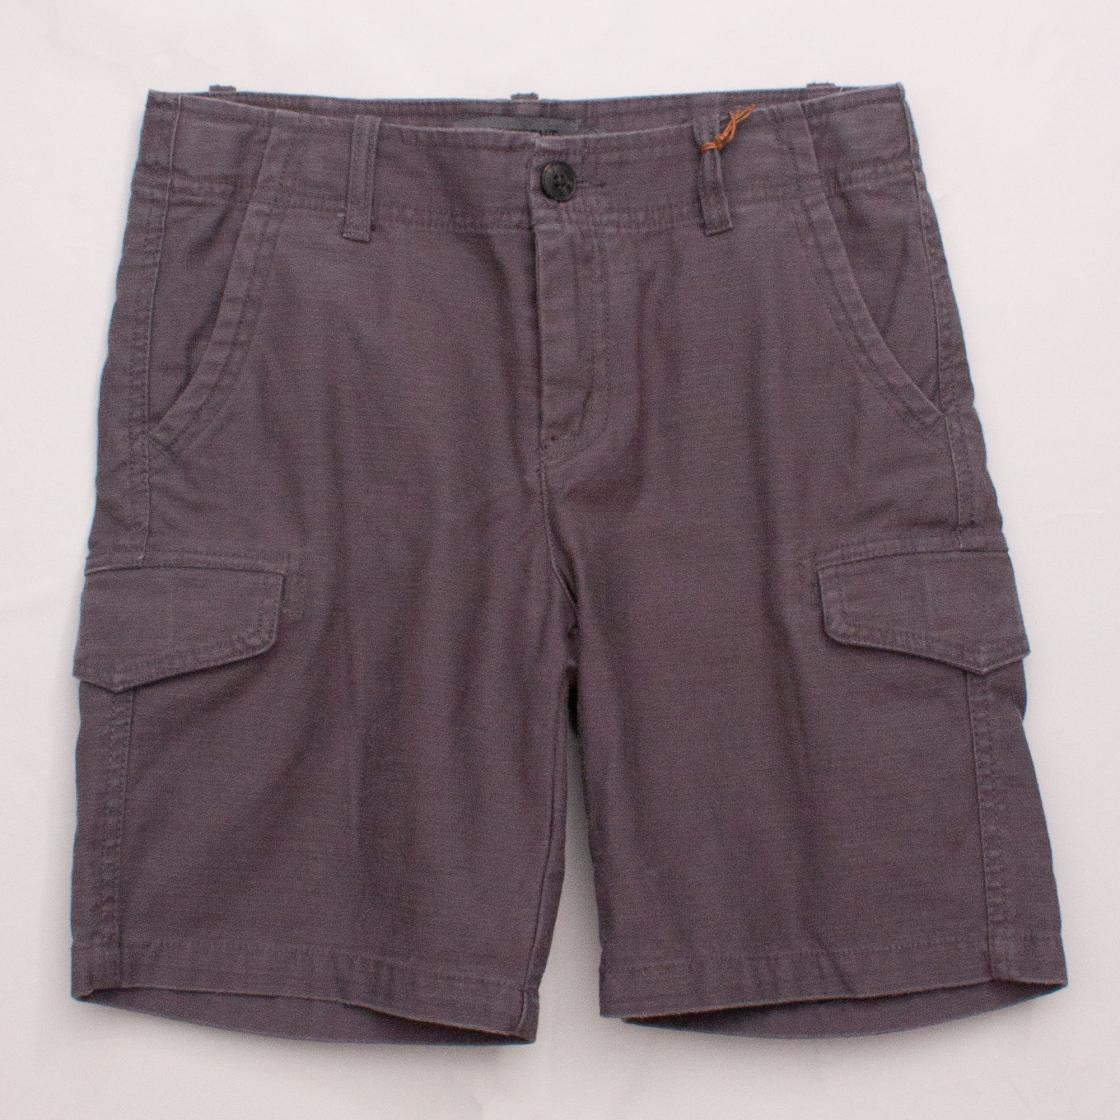 "Pavement Charcoal Shorts ""Brand New"""